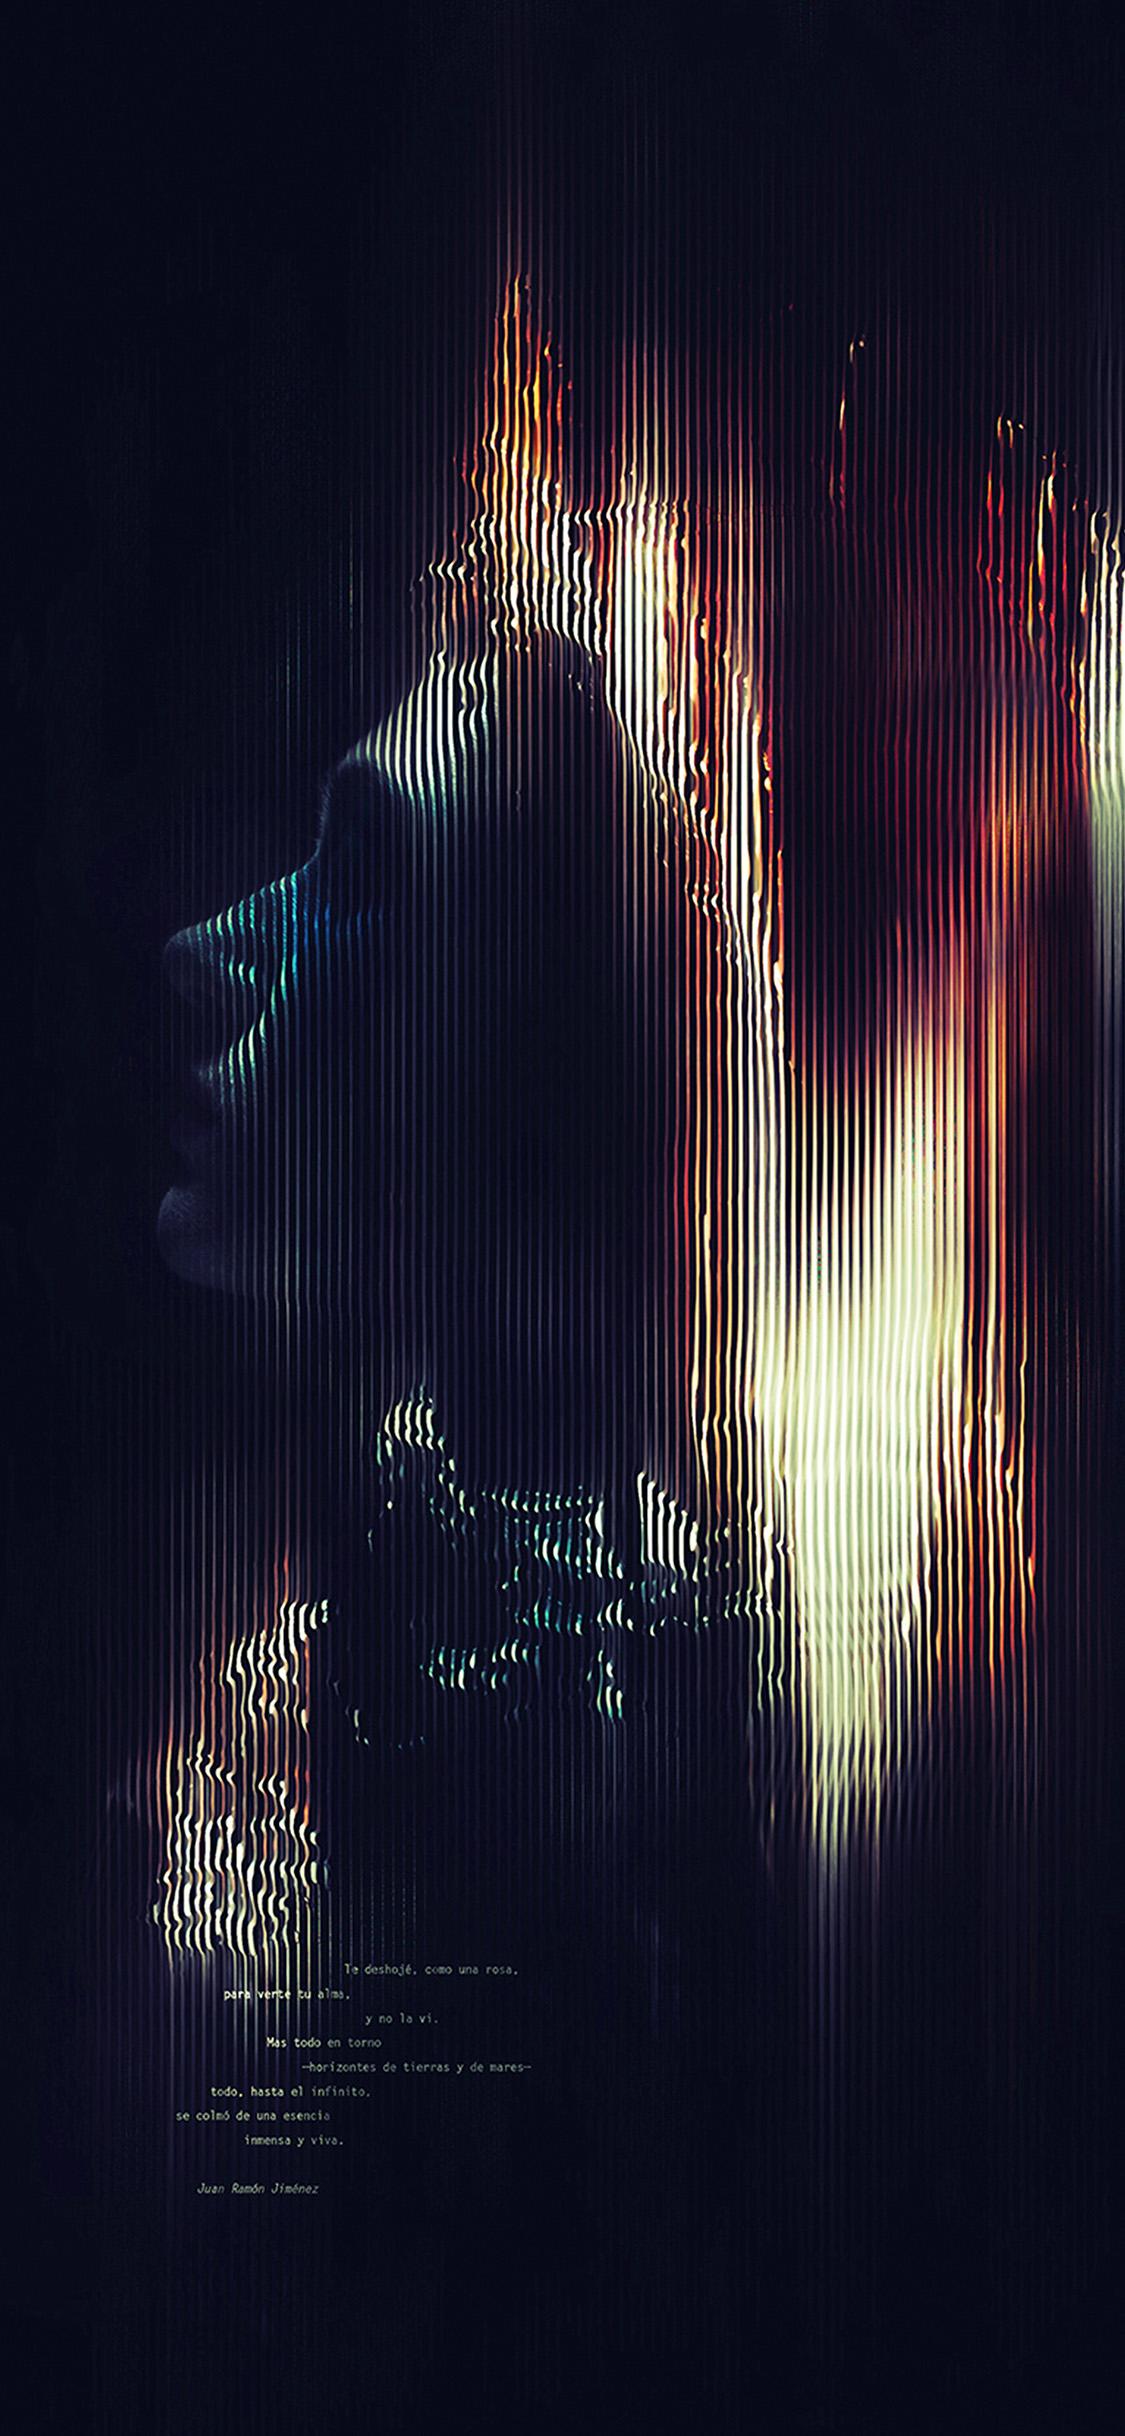 iPhonexpapers.com-Apple-iPhone-wallpaper-bc87-retoka-dark-line-digital-pattern-art-illustration-abstract